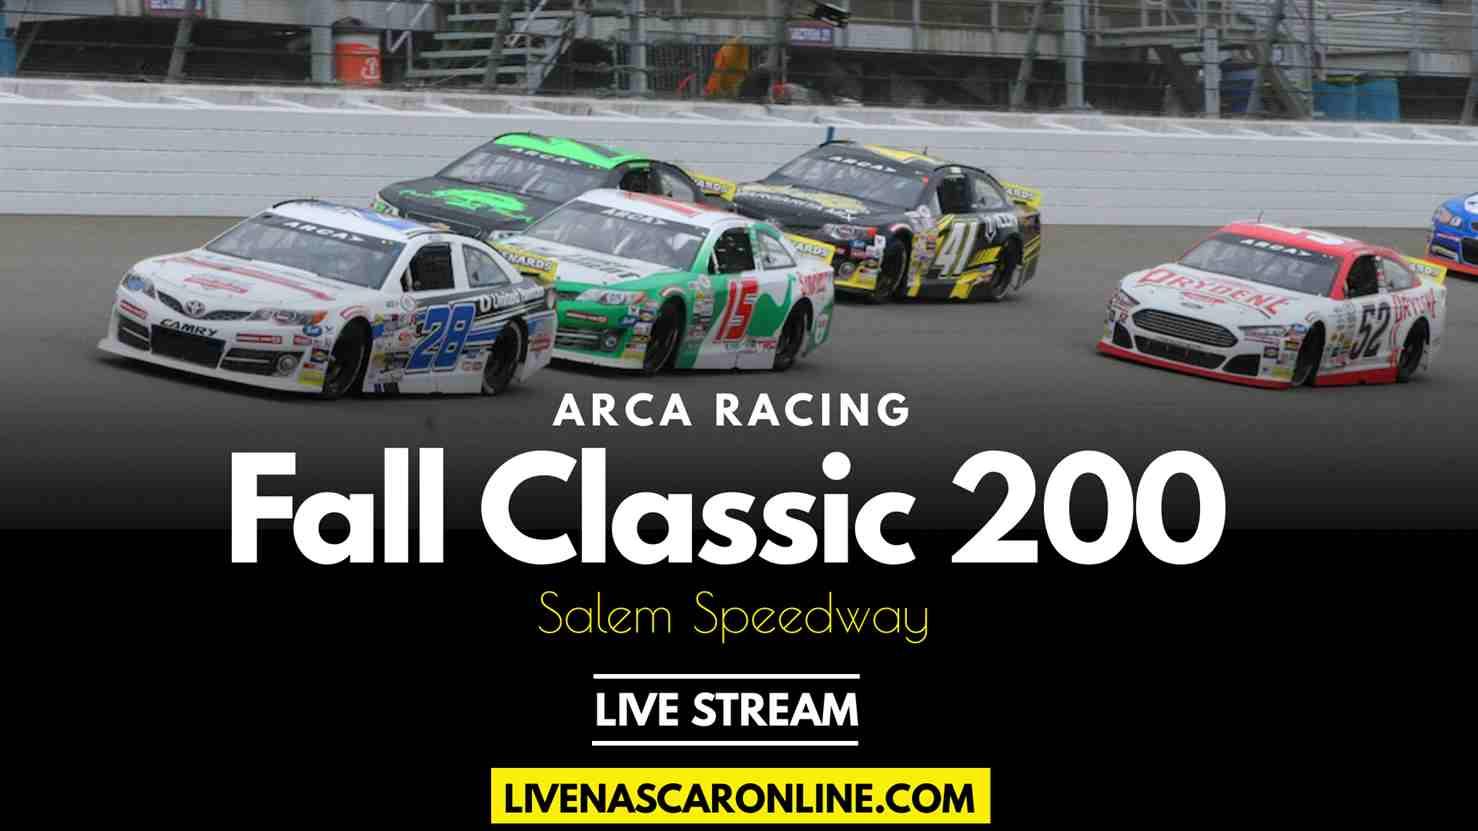 ARCA Fall Classic 200 Live Stream 2021